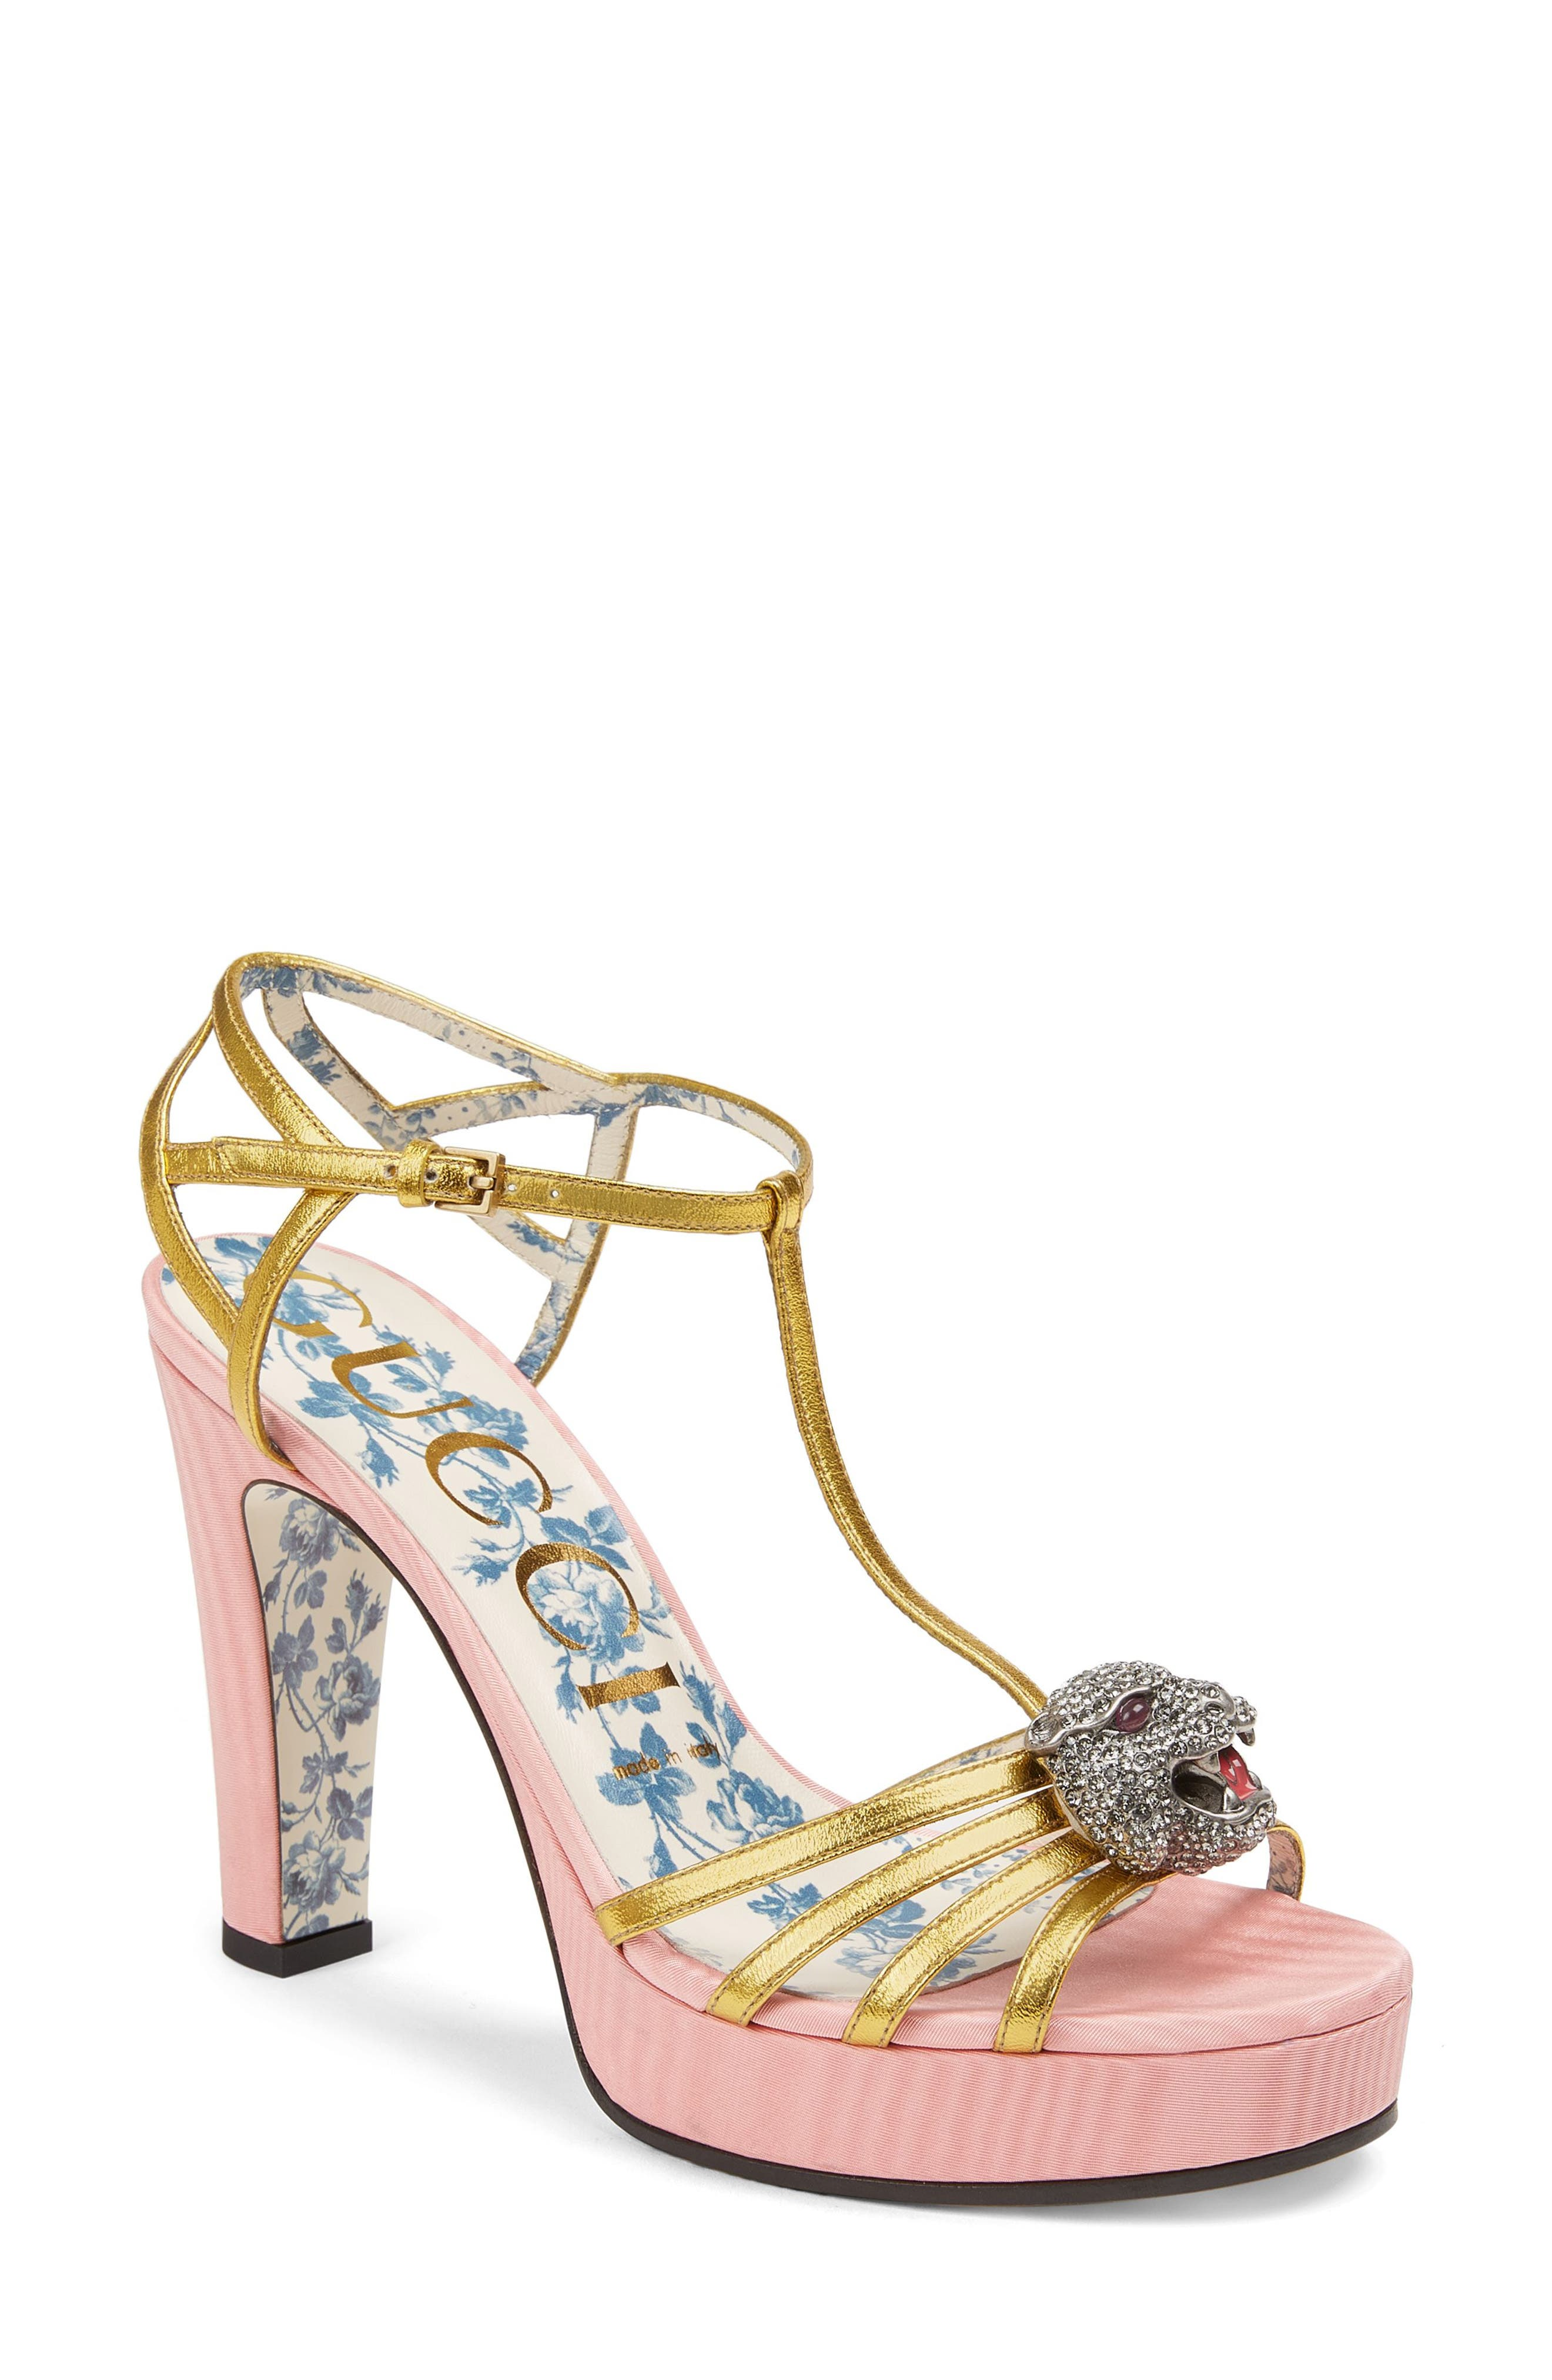 Main Image - Gucci Elias Crystal Tiger T-Strap Sandal (Women)